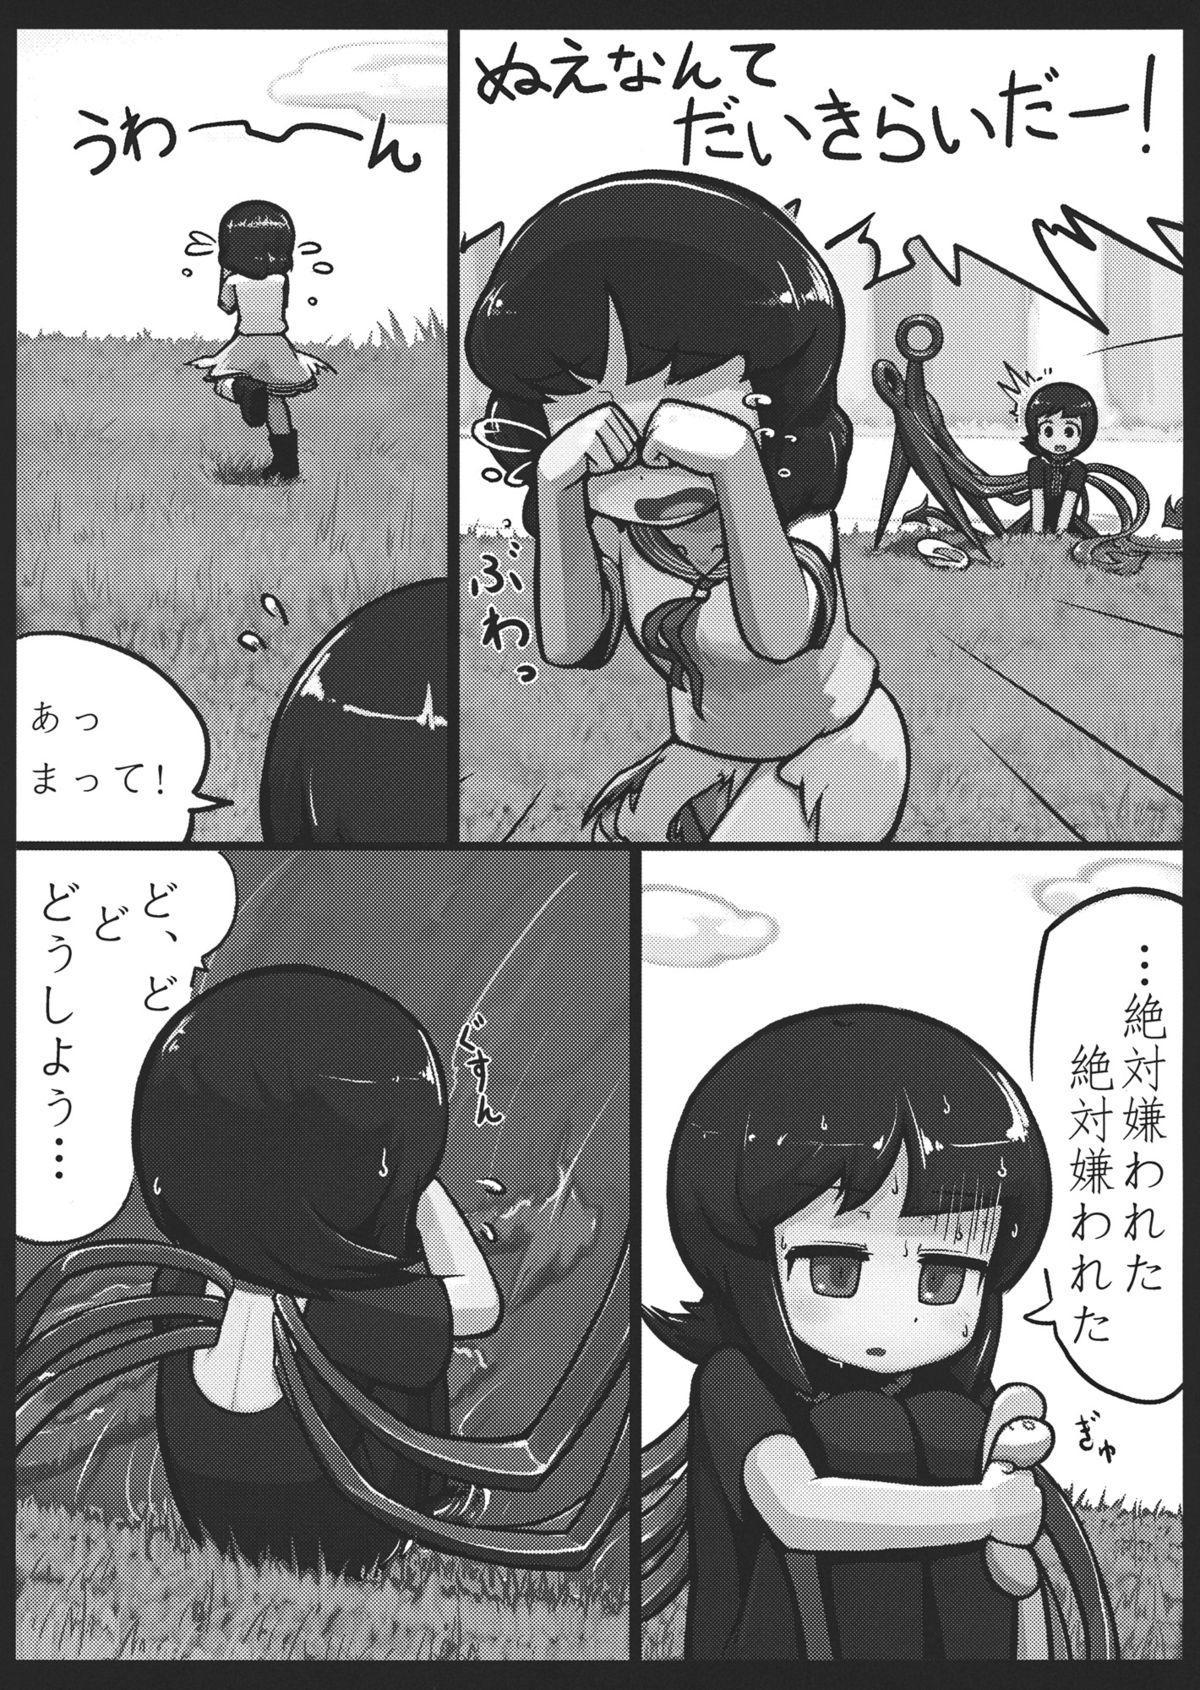 Nue x Murasa Shunga 23